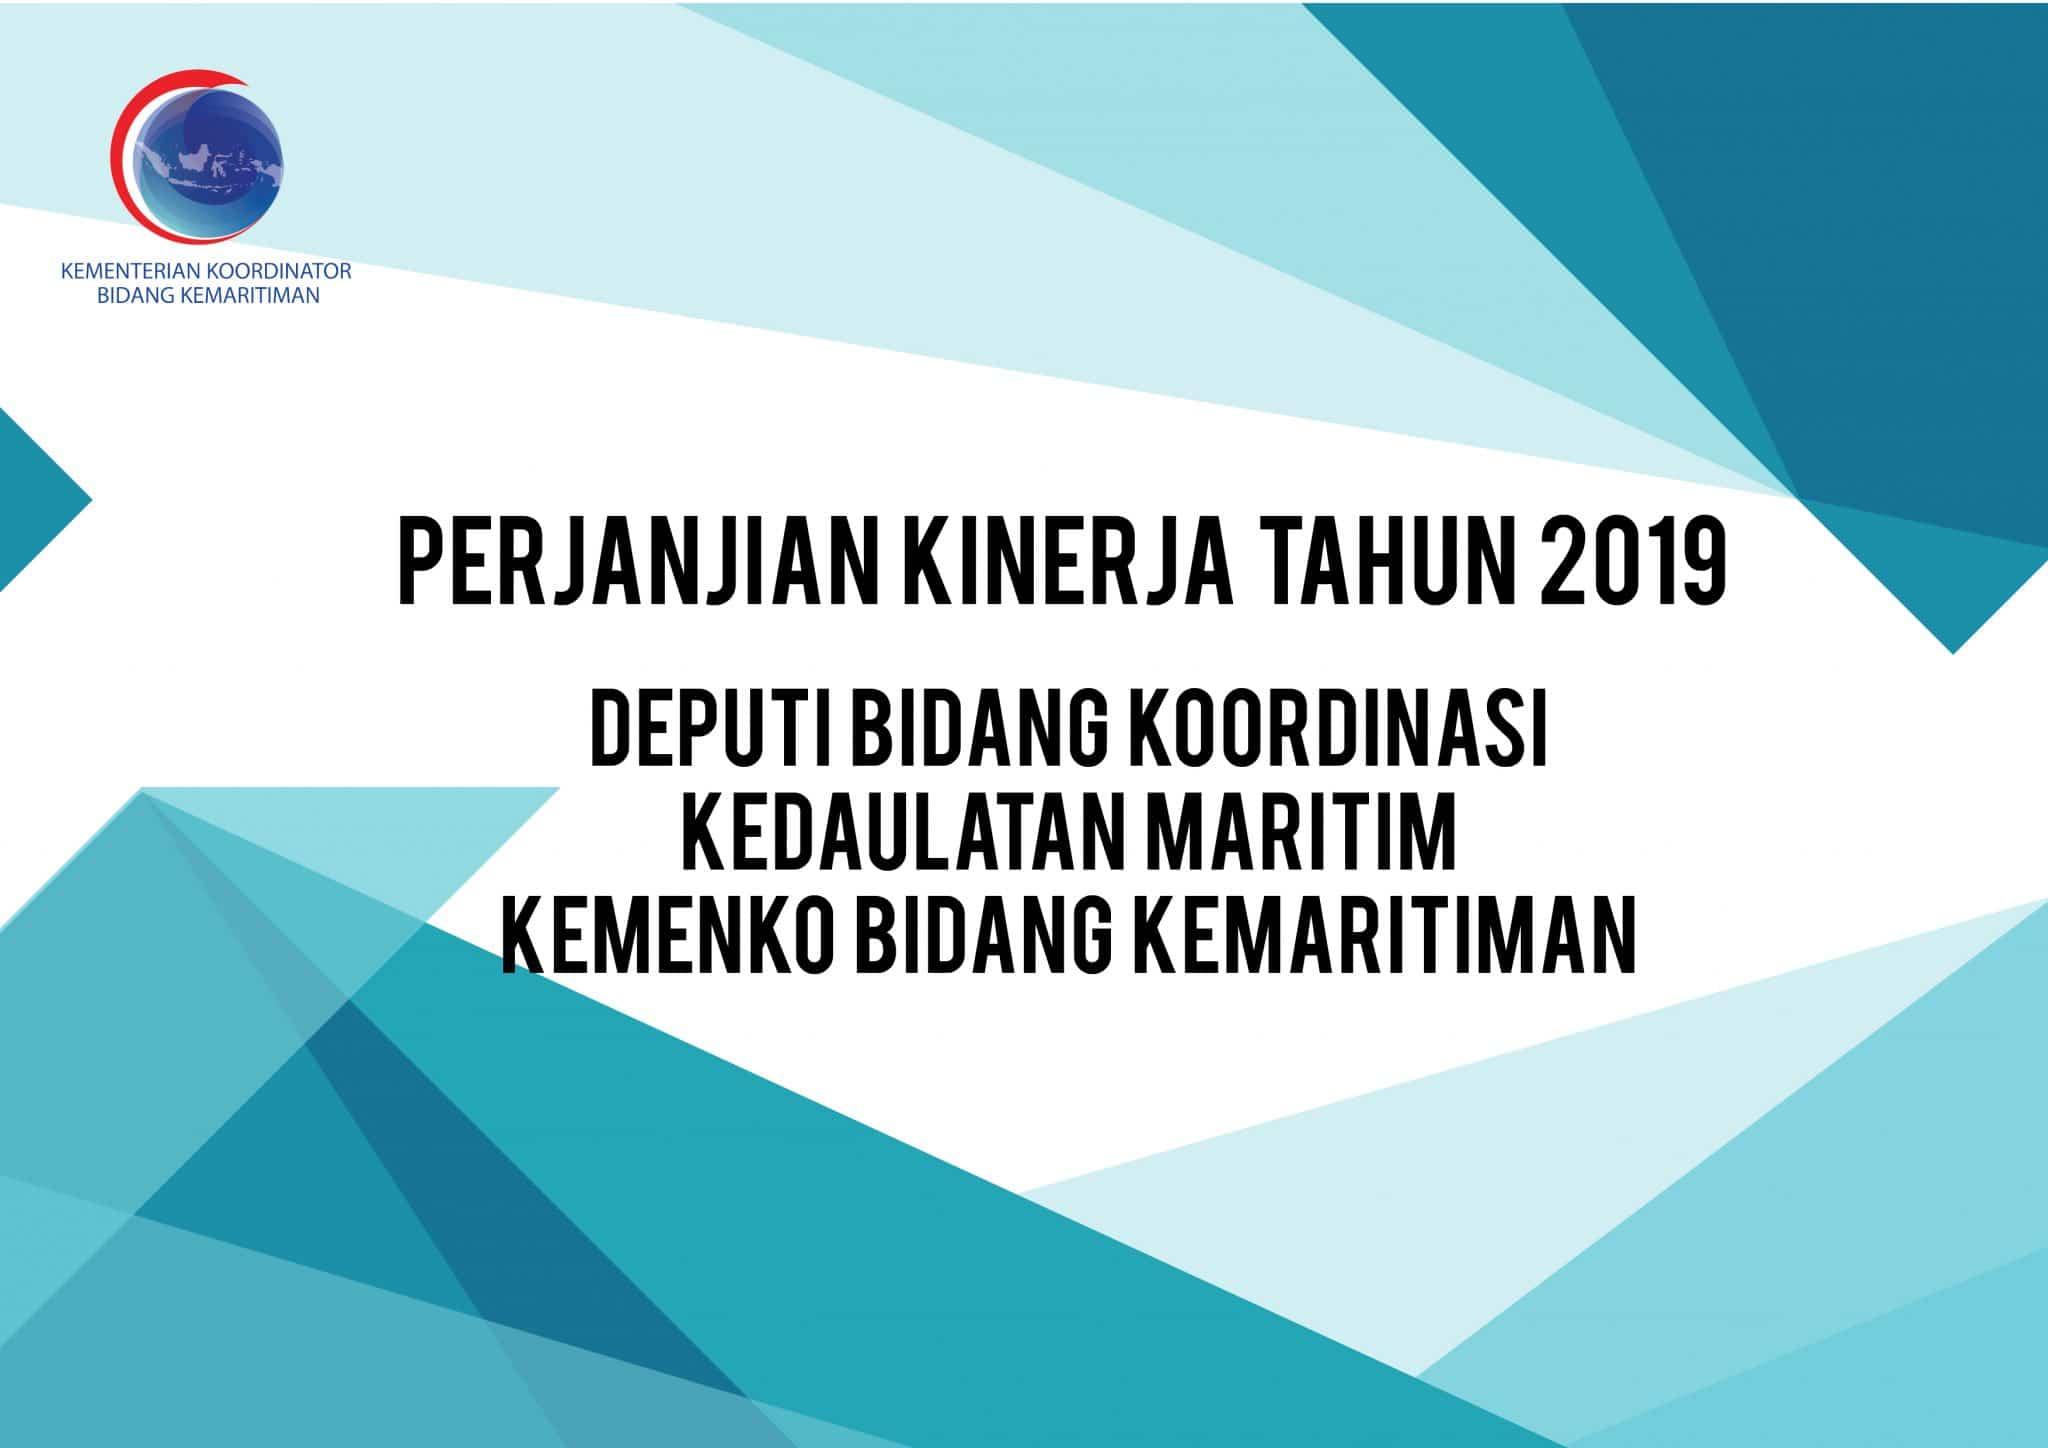 Perjanjian Kinerja Tahun 2019 Deputi Bidang Koordinasi Kedaulatan Maritim Kemenko Bidang Kemaritiman